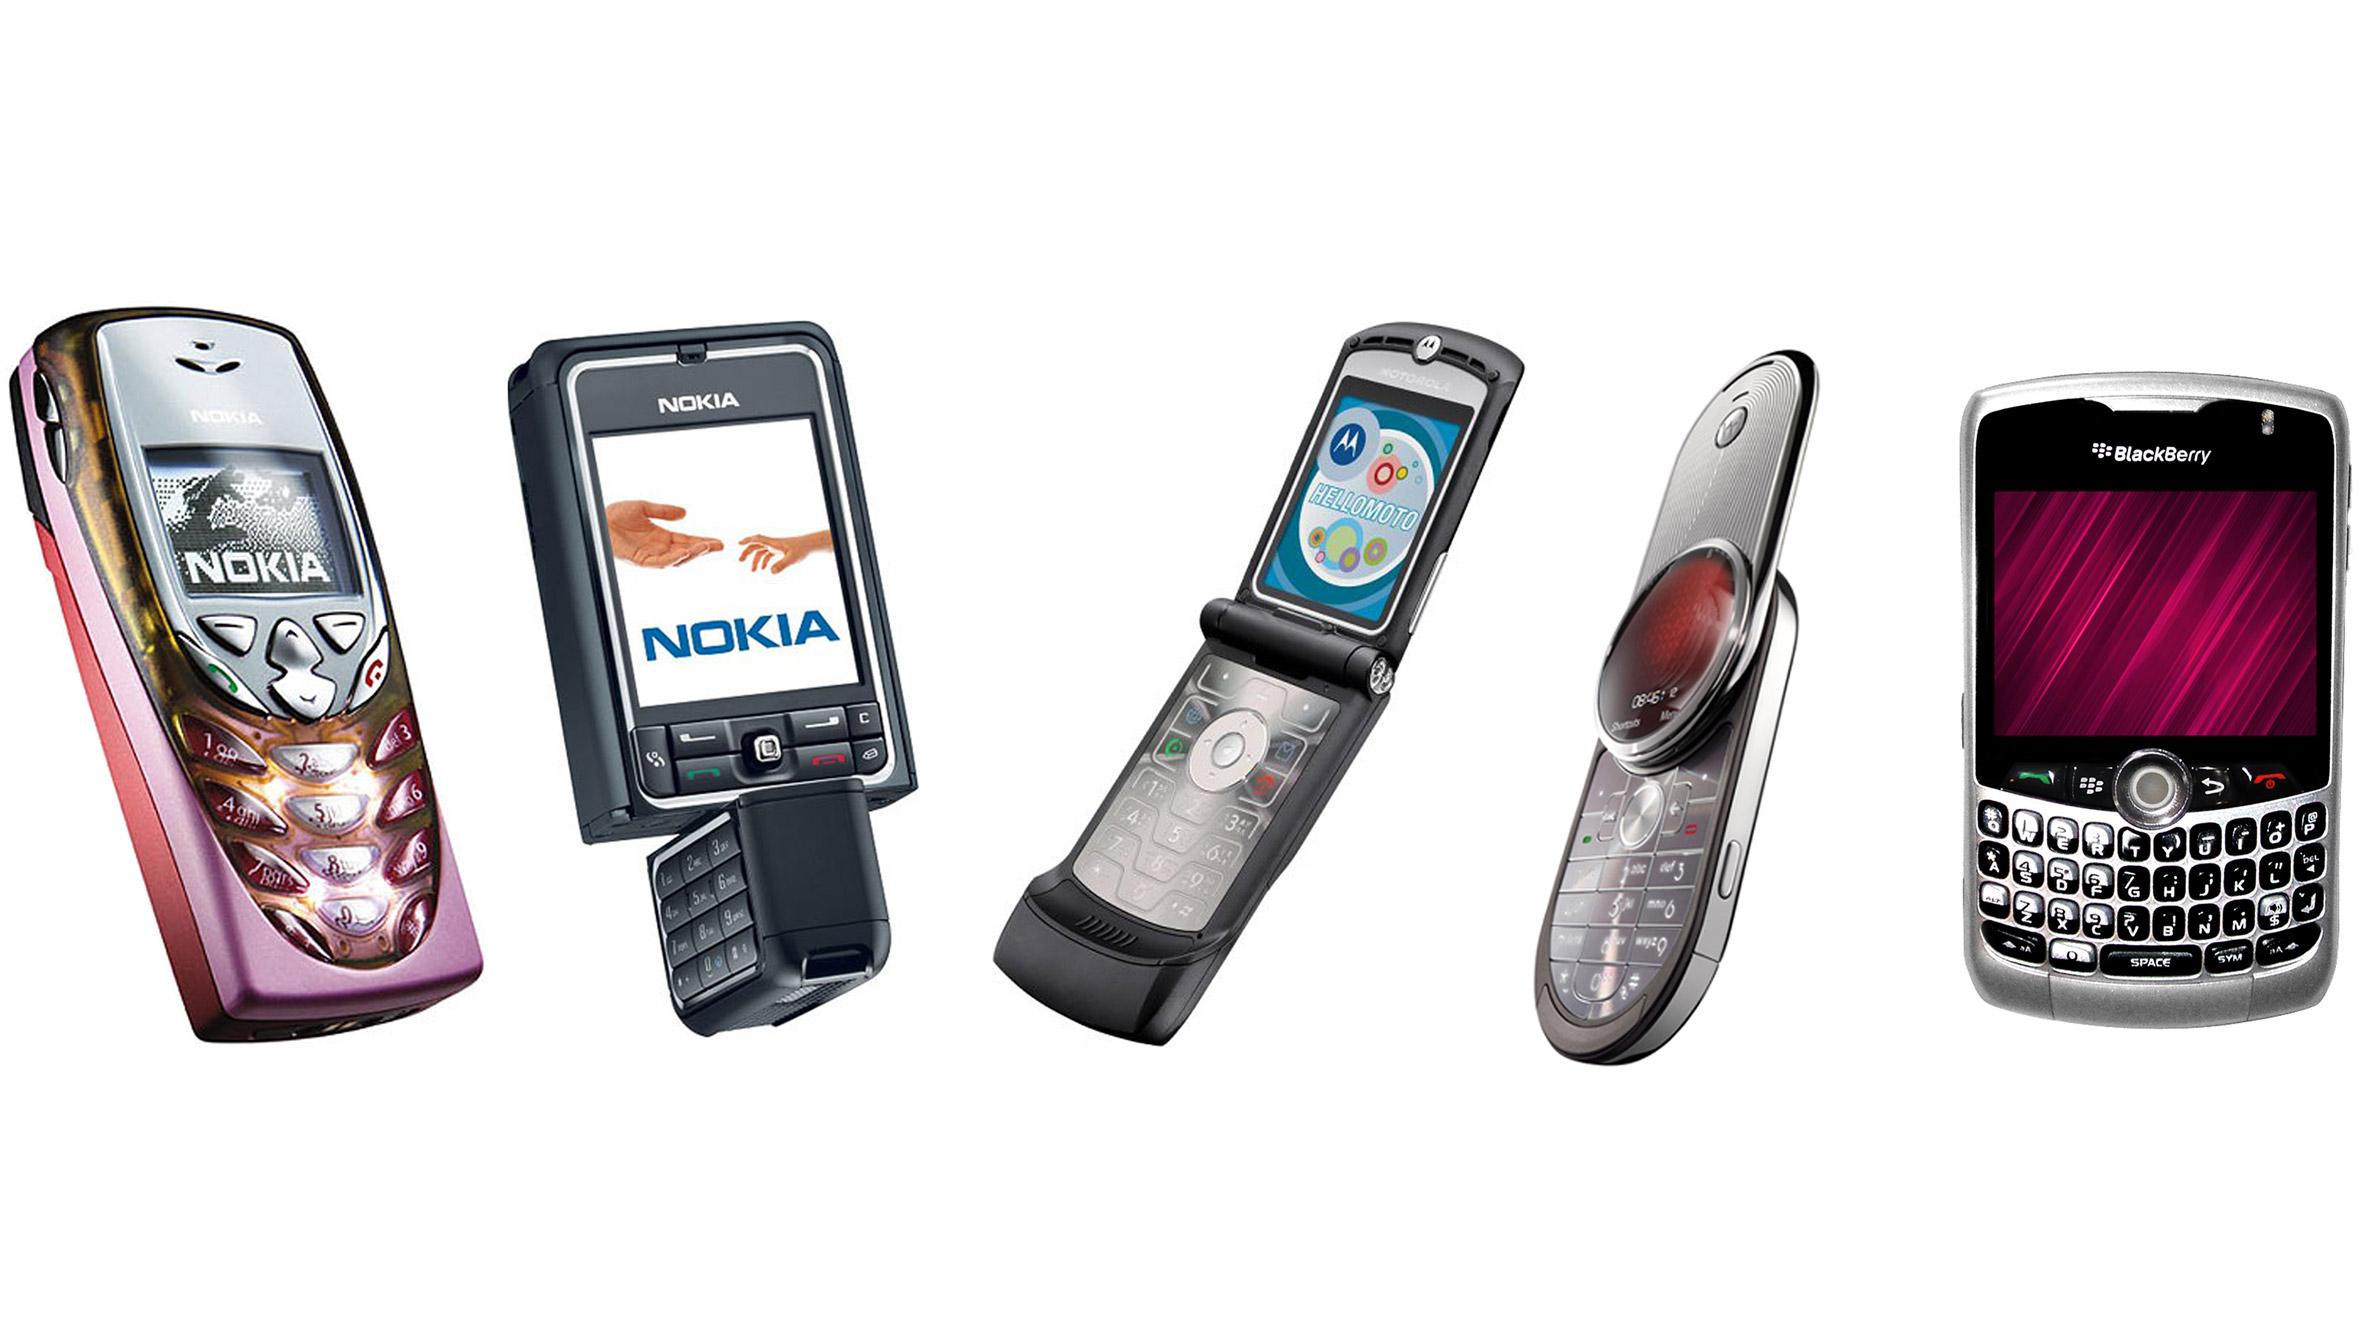 nokia phones 2000. nokia phones 2000 2